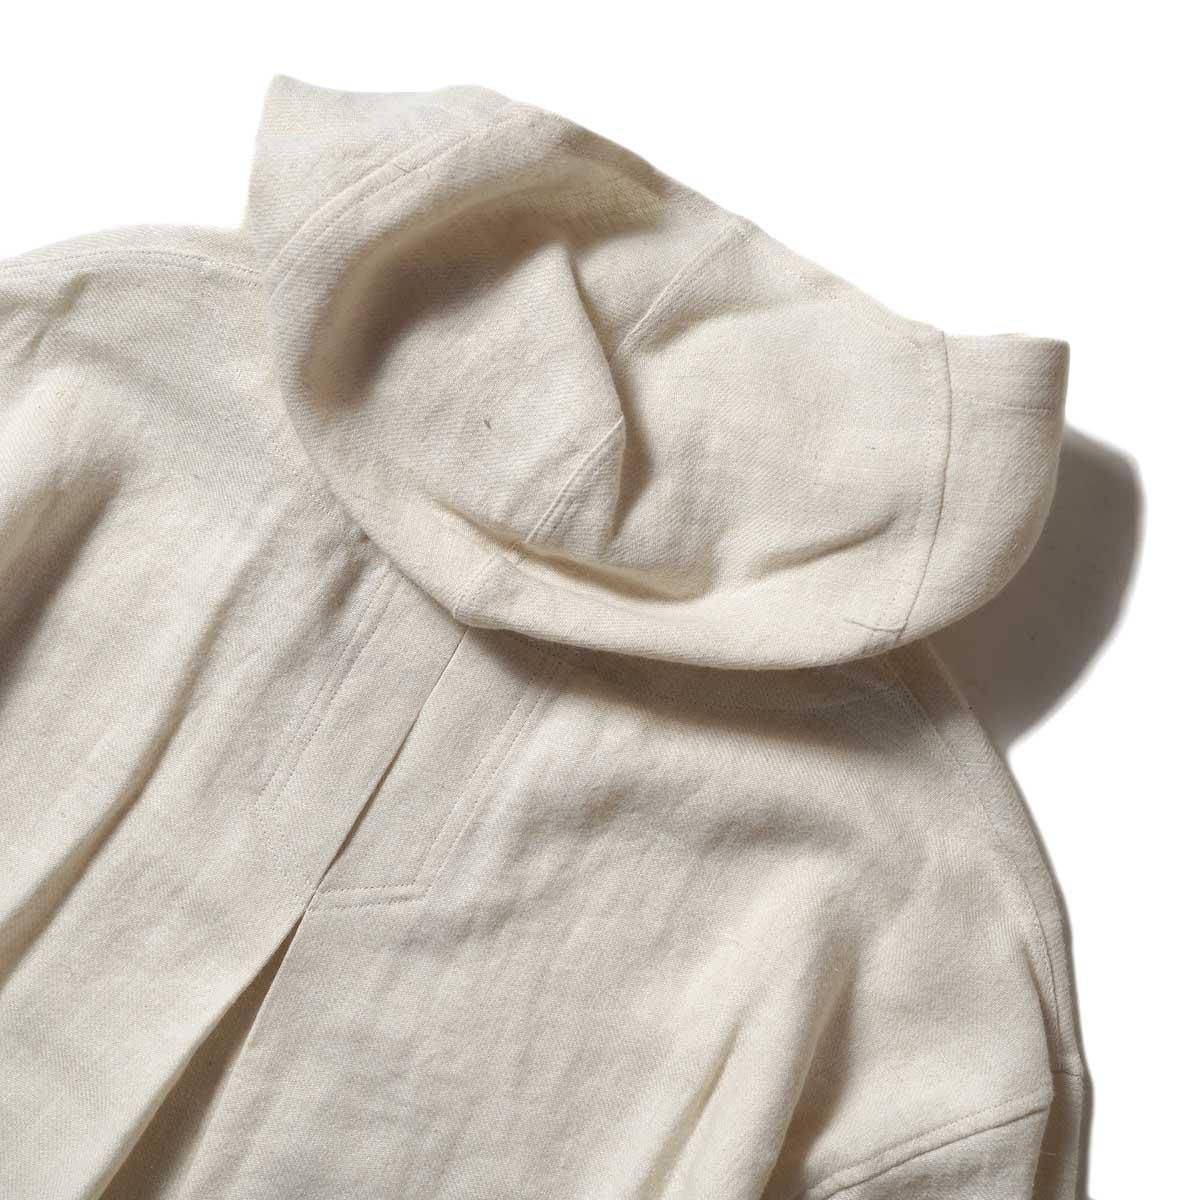 ARCHI / SOFT TWIST TWILL HOODIE OVER SHIRTS (White) 背面・フード